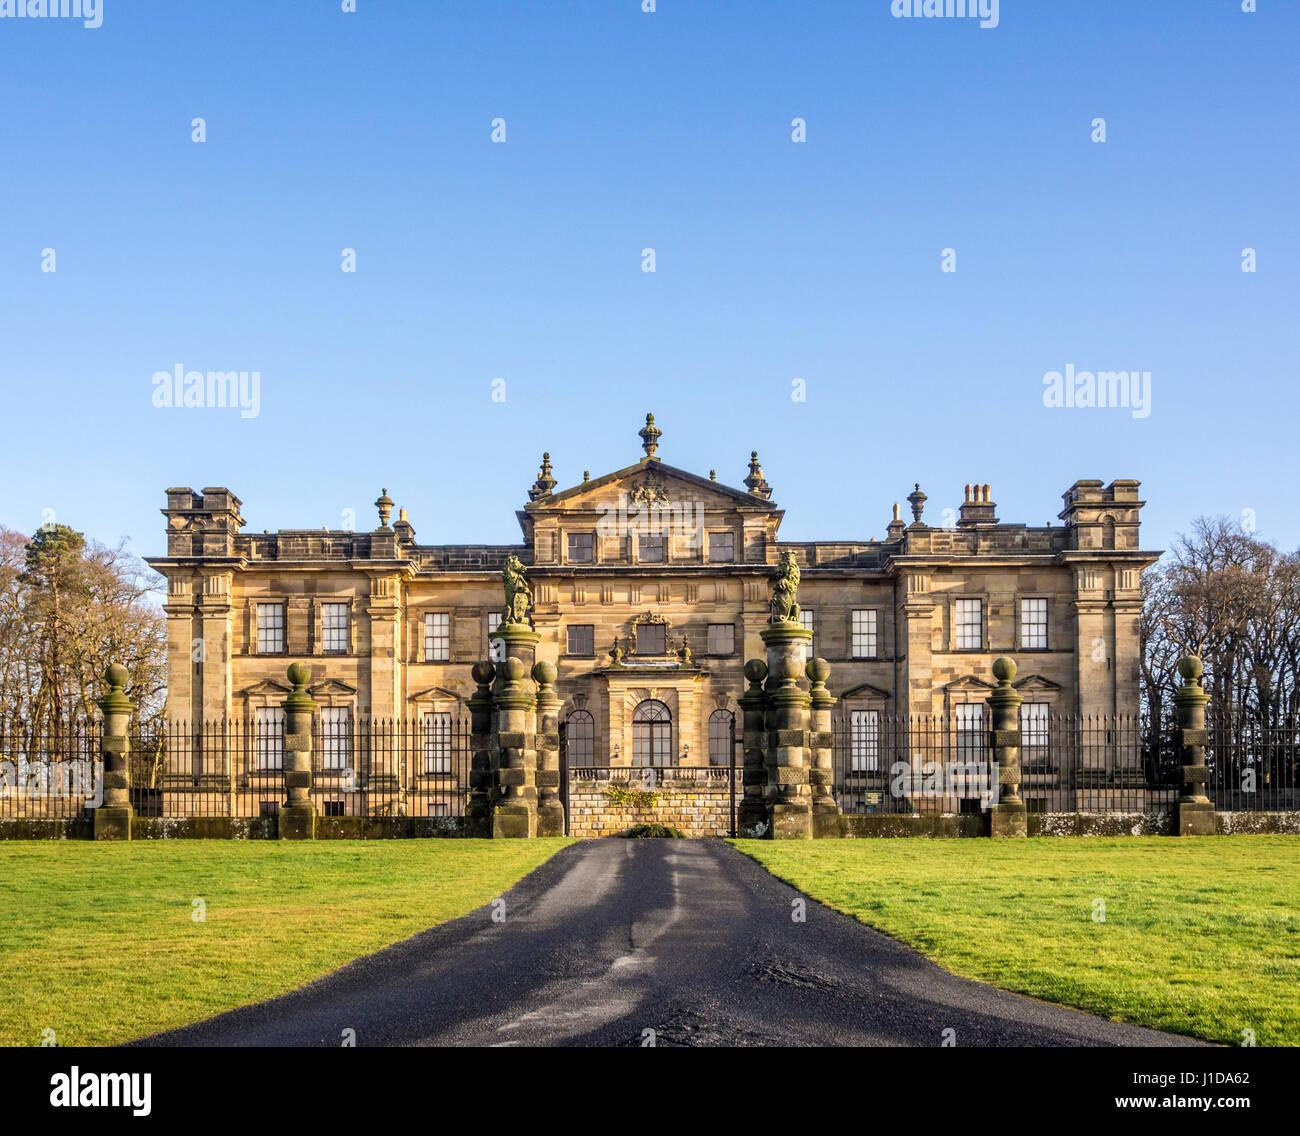 Duncombe Park, seat of the Duncombe family whose senior member takes the title Baron Feversham. Helmsley, UK. - Stock Image